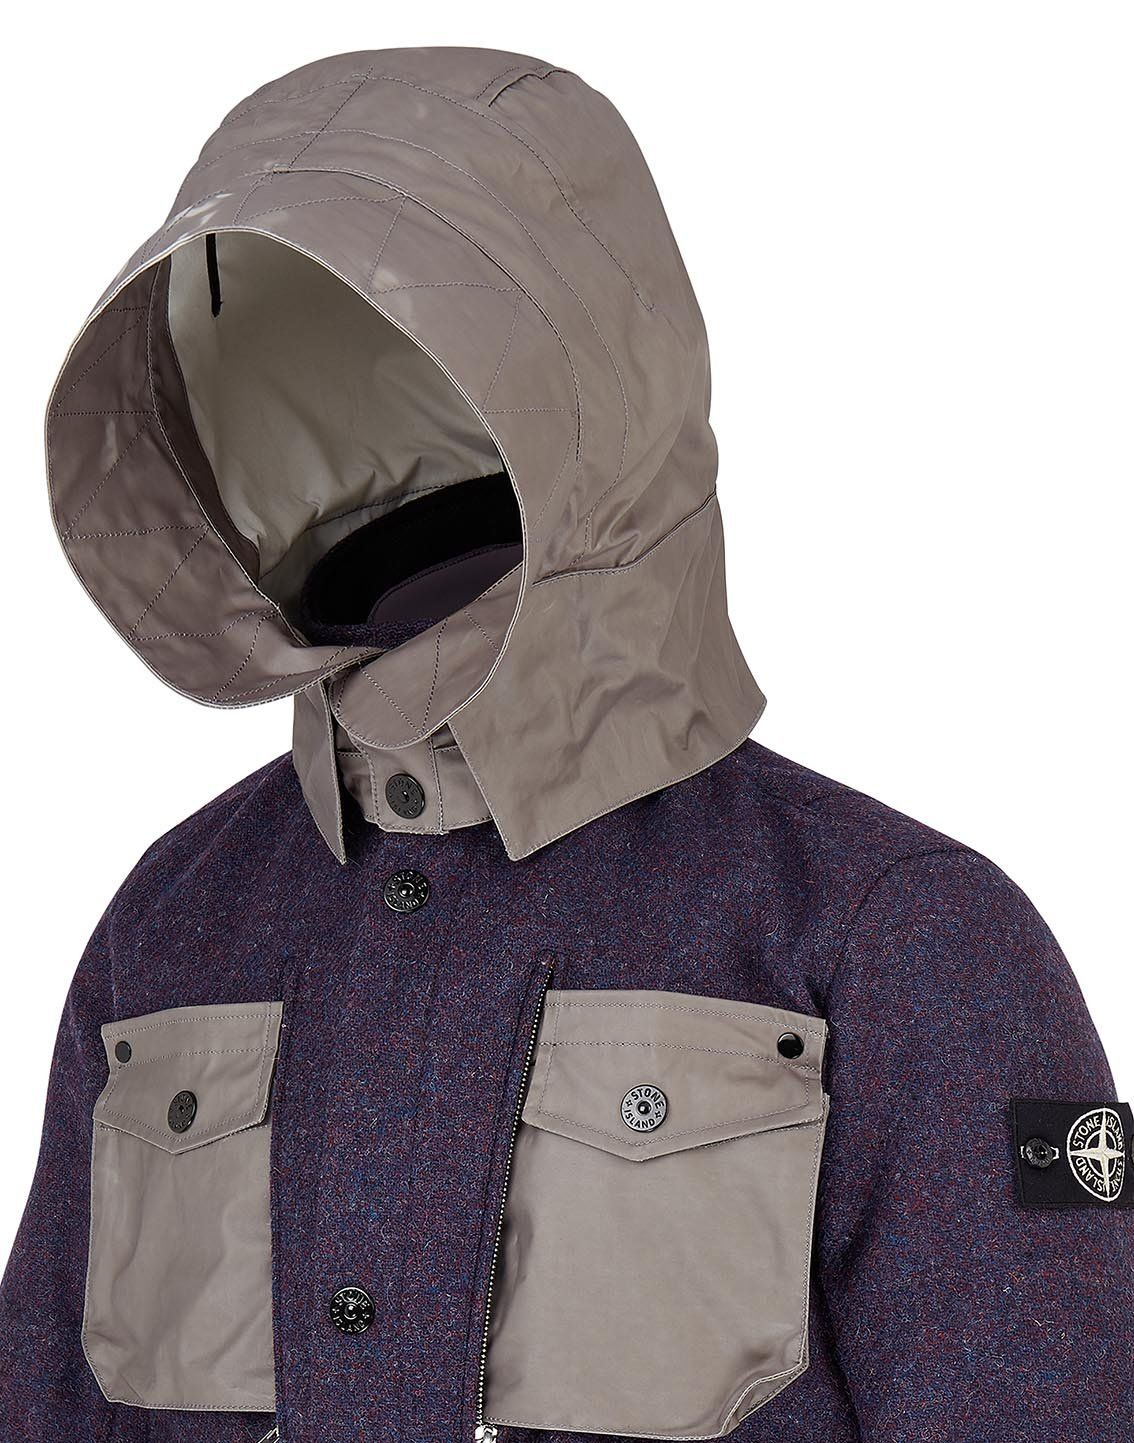 competitive price c52f3 8e5bf 4979A STONE ISLAND   HARRIS TWEED POLYMORPHIC ICE Jacket in Purple